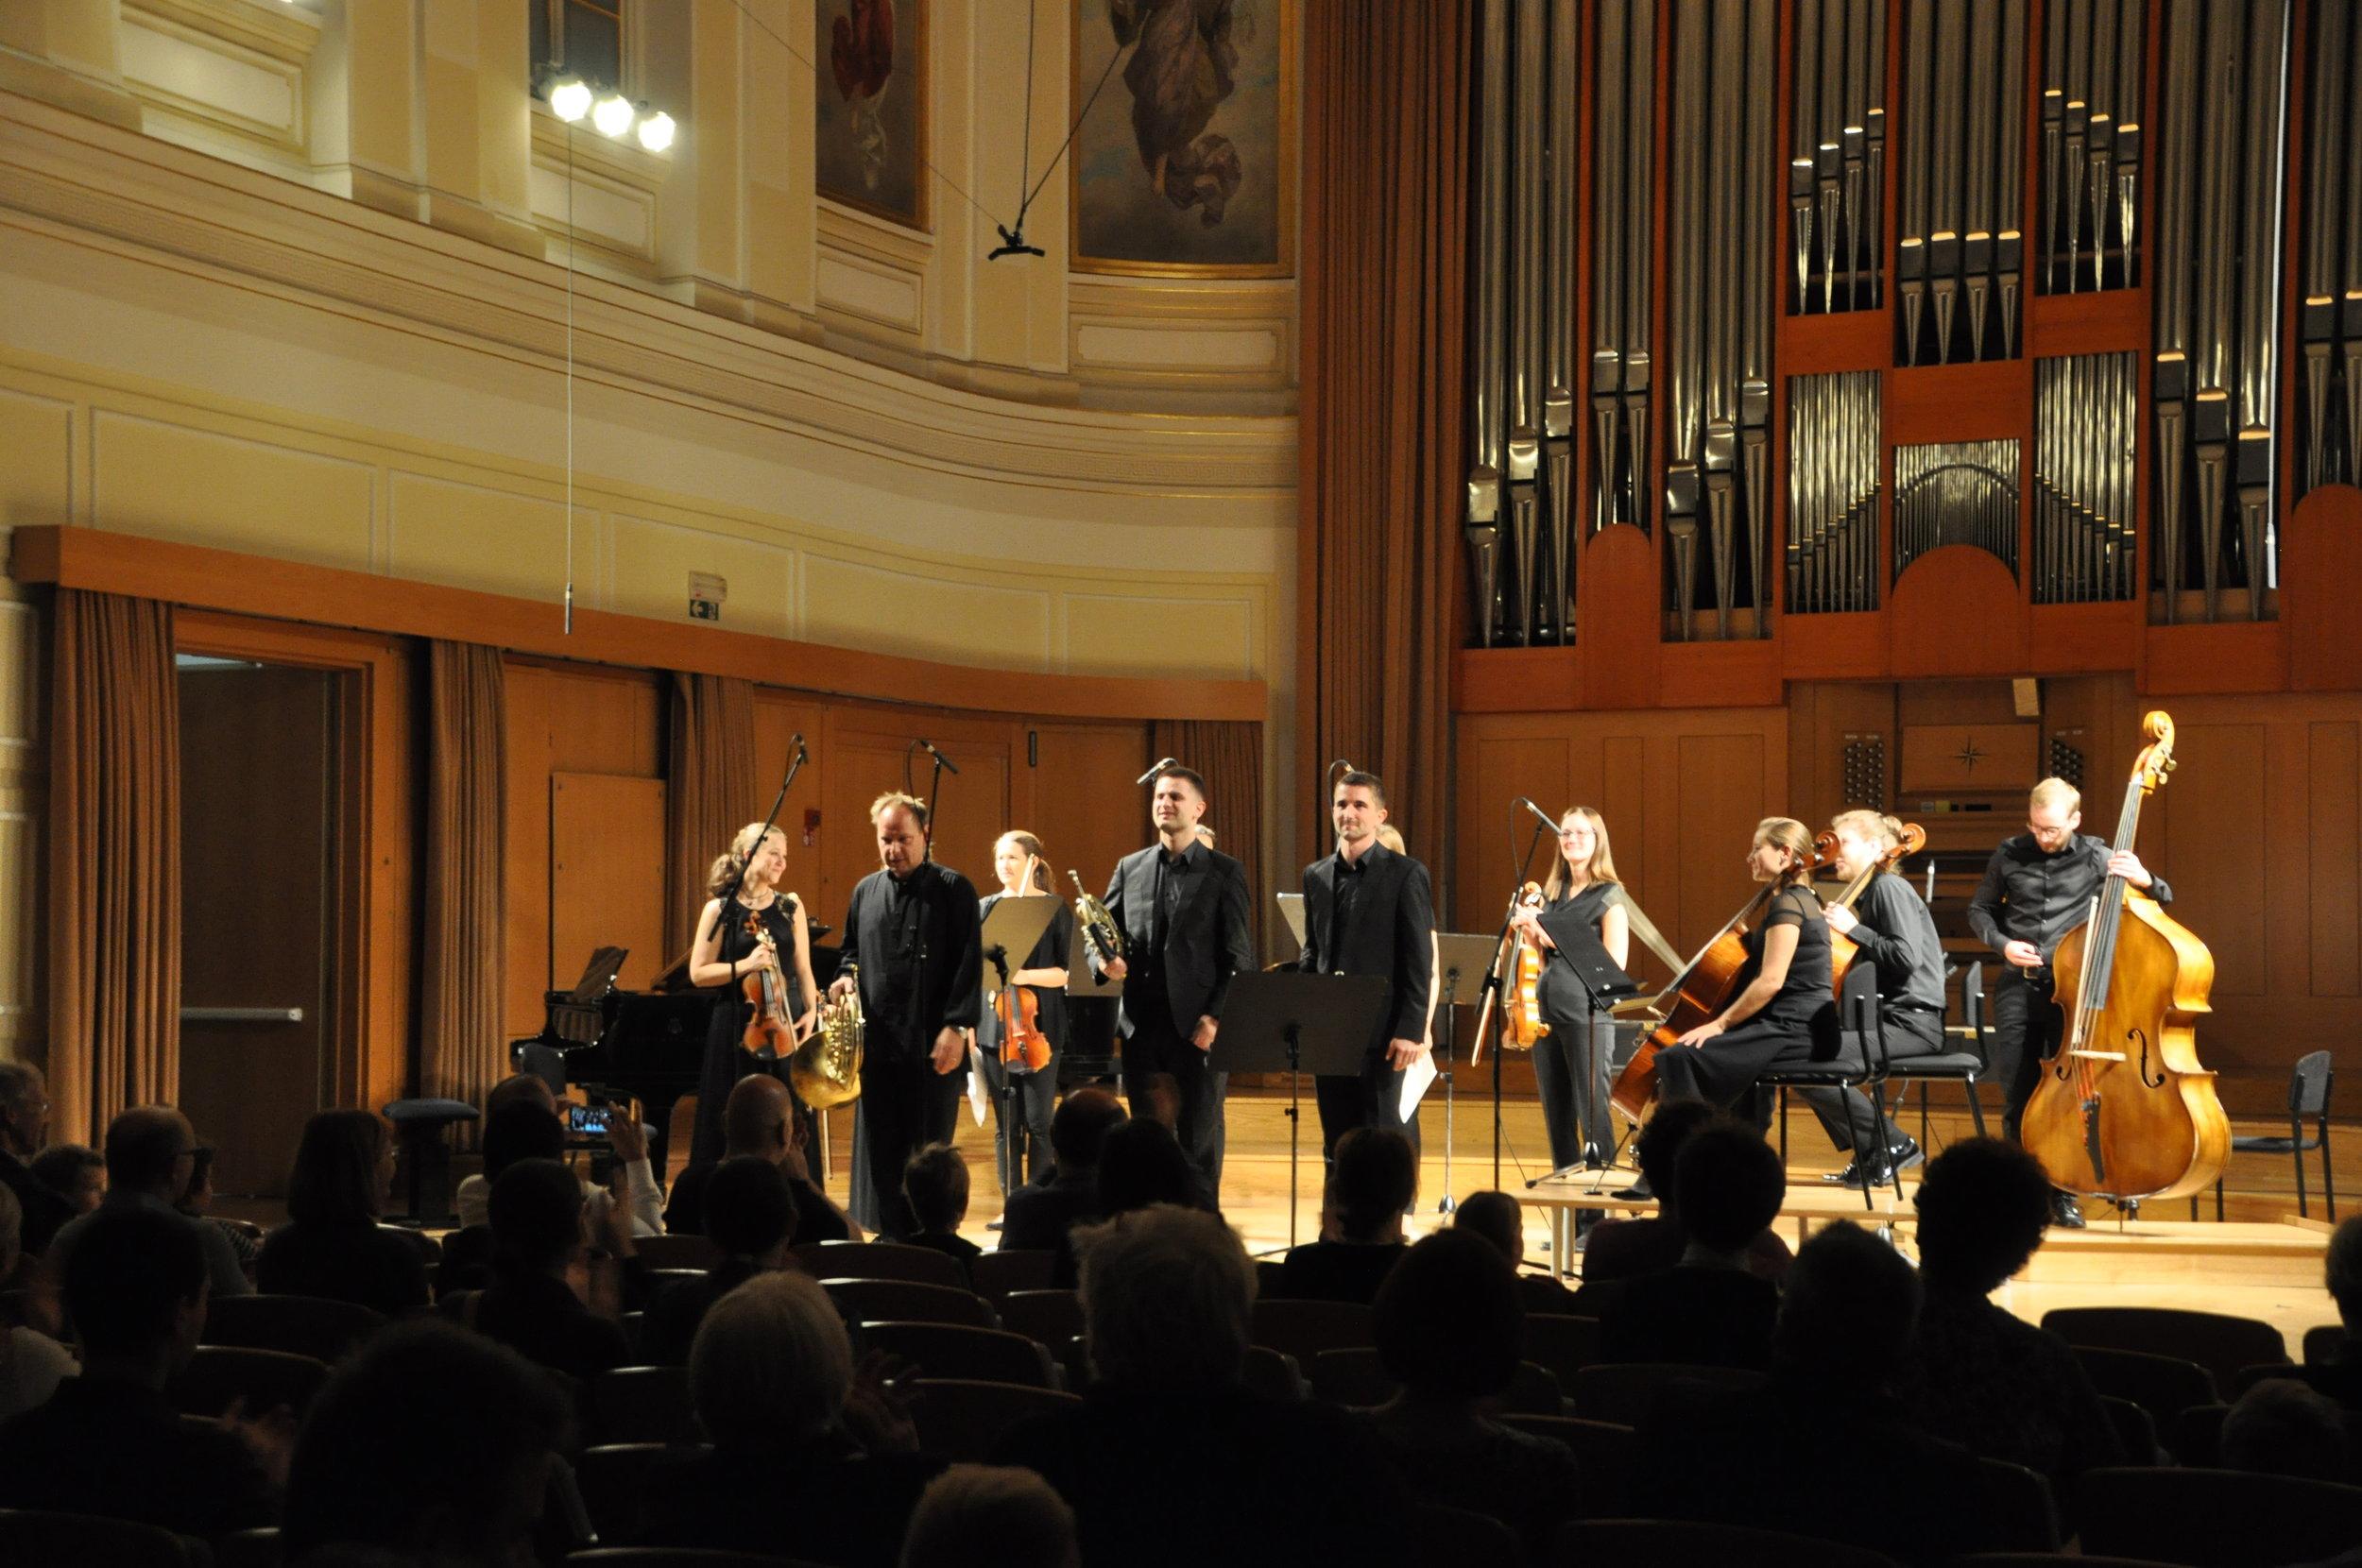 Koncert II - Boštjan Lipovšek & Co.